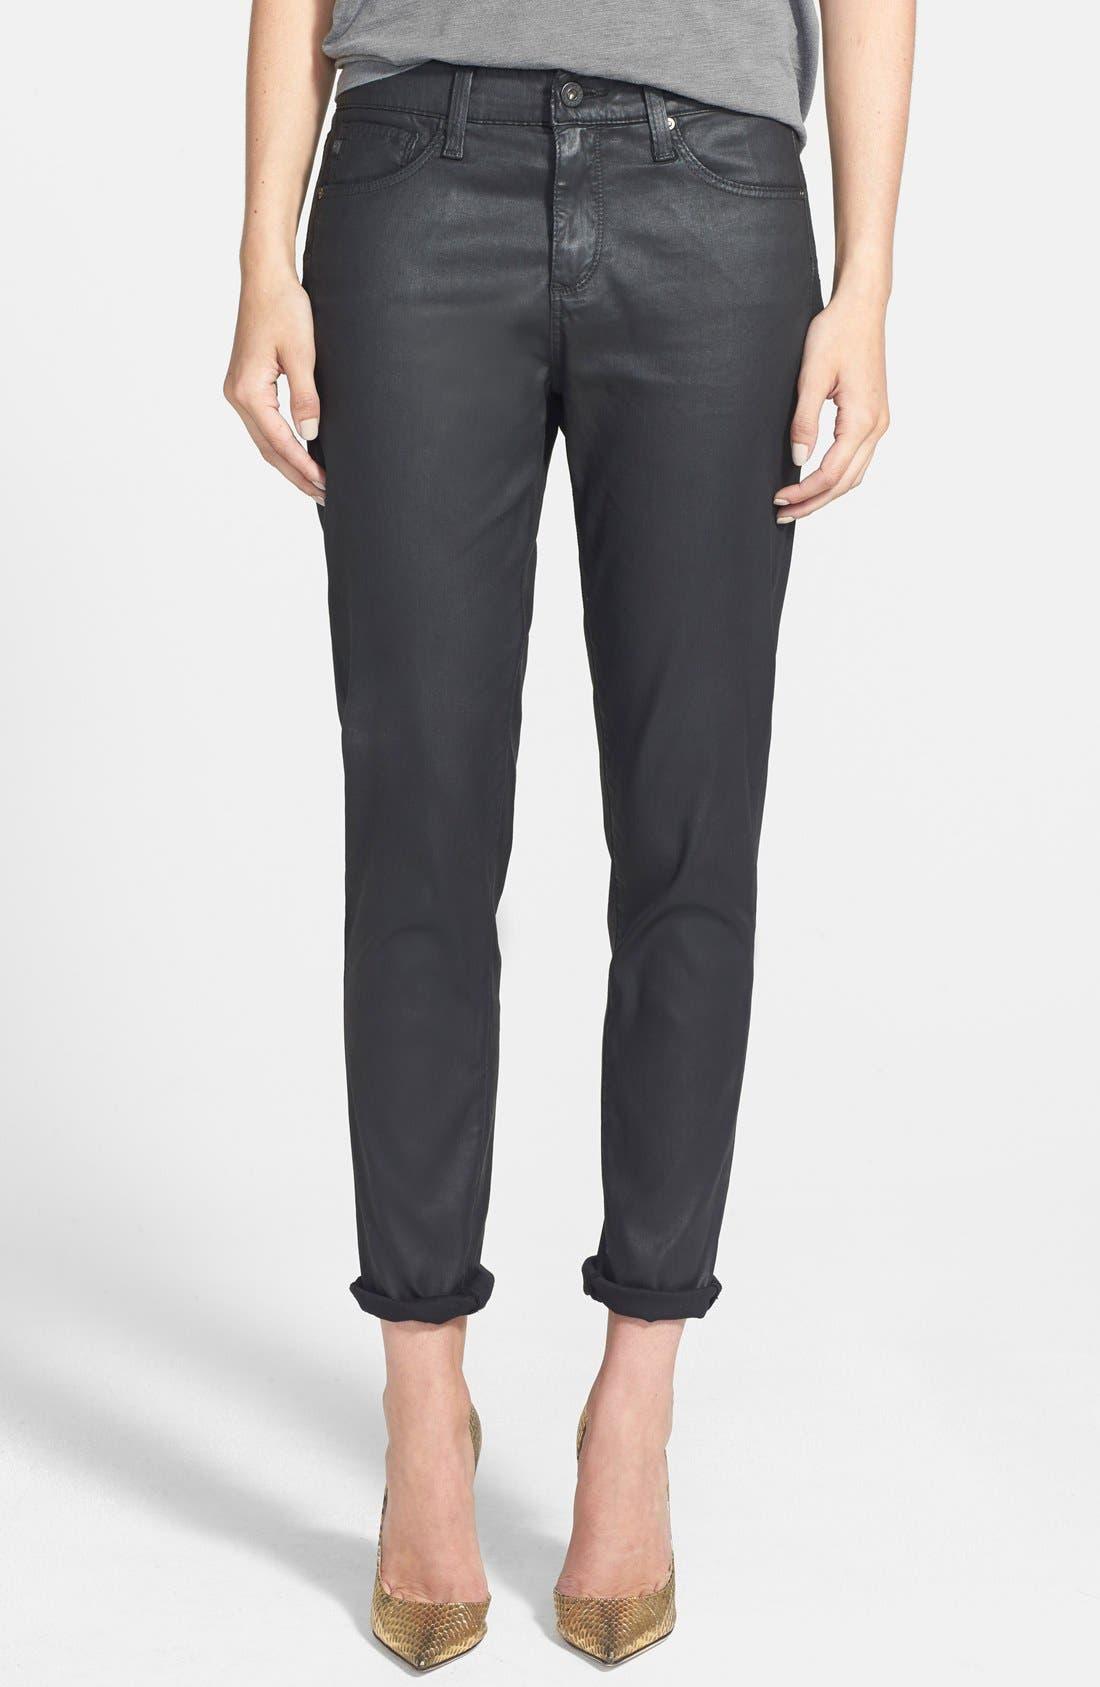 Alternate Image 1 Selected - AG 'Leatherette Beau' Coated Boyfriend Skinny Jeans (Leatherette Black)